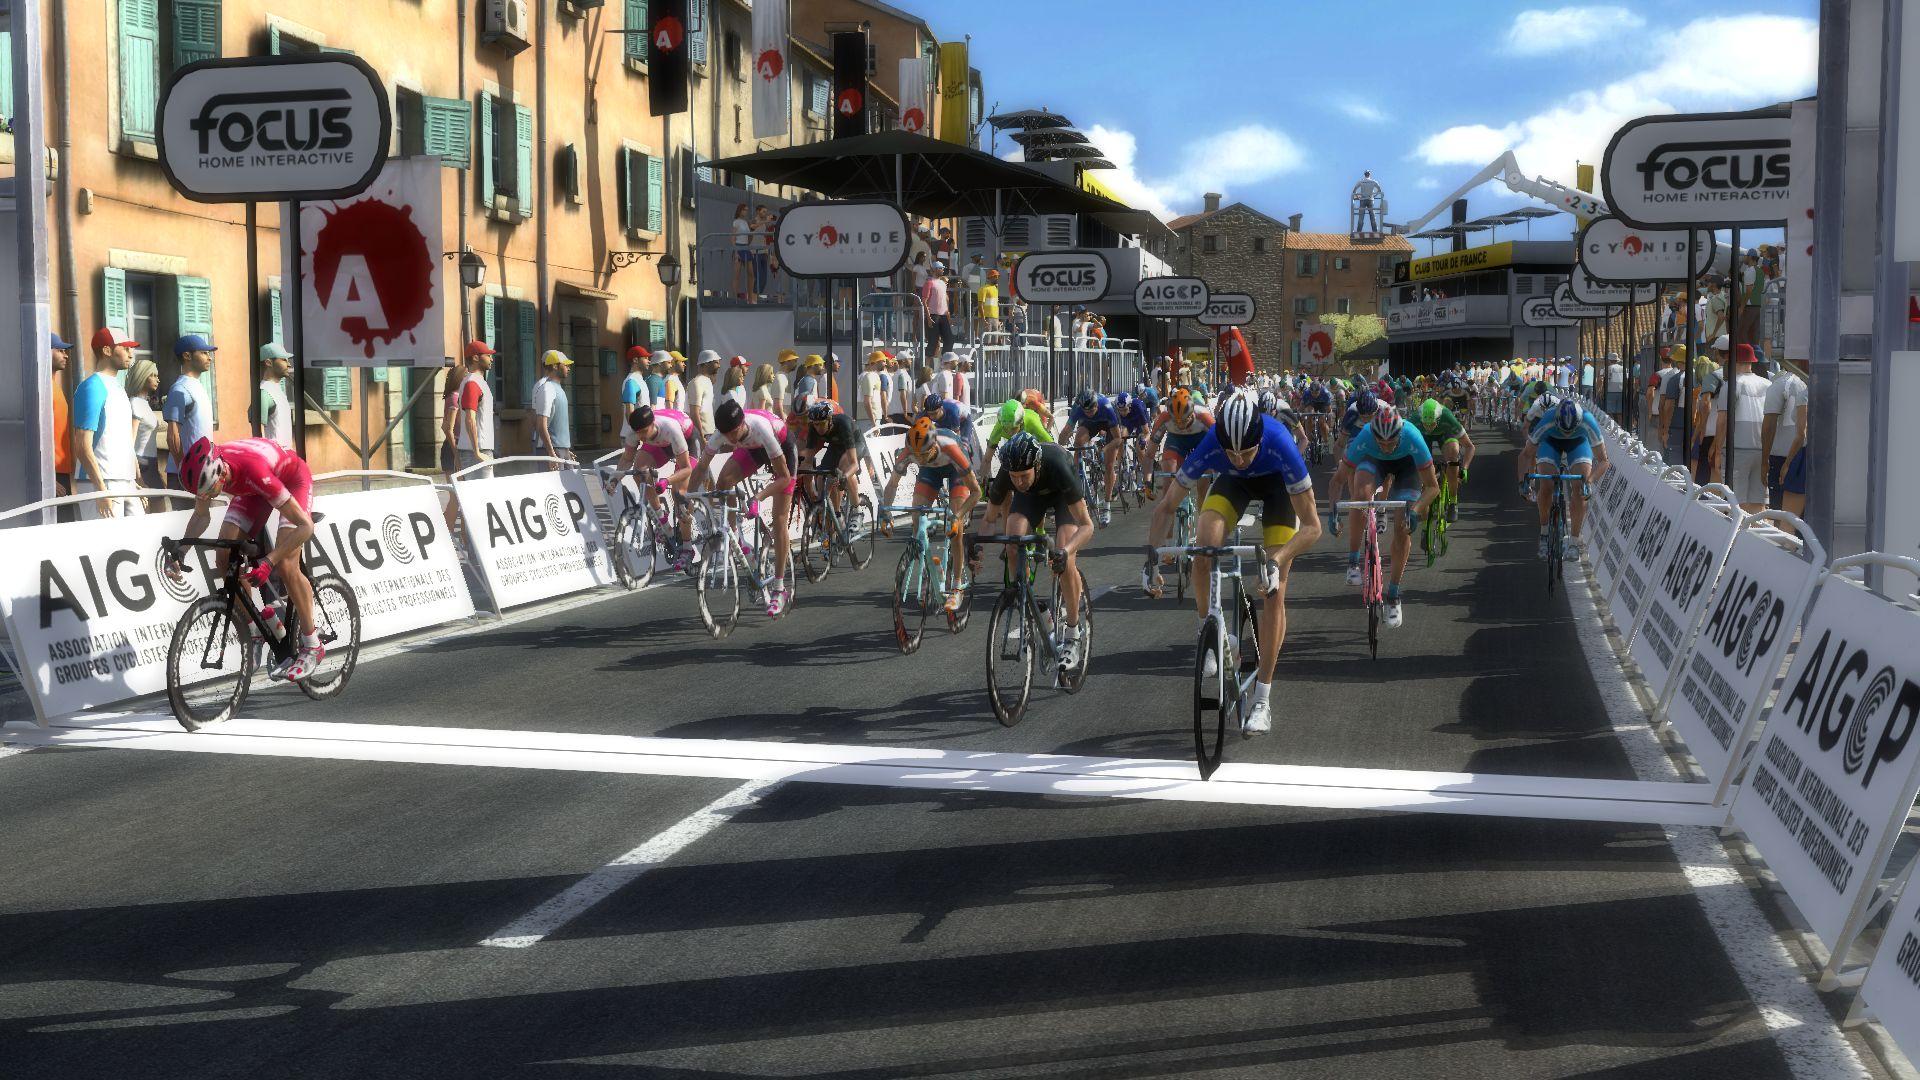 pcmdaily.com/images/mg/2019/Races/PT/Tirreno/mg19_ta_s07_28.jpg